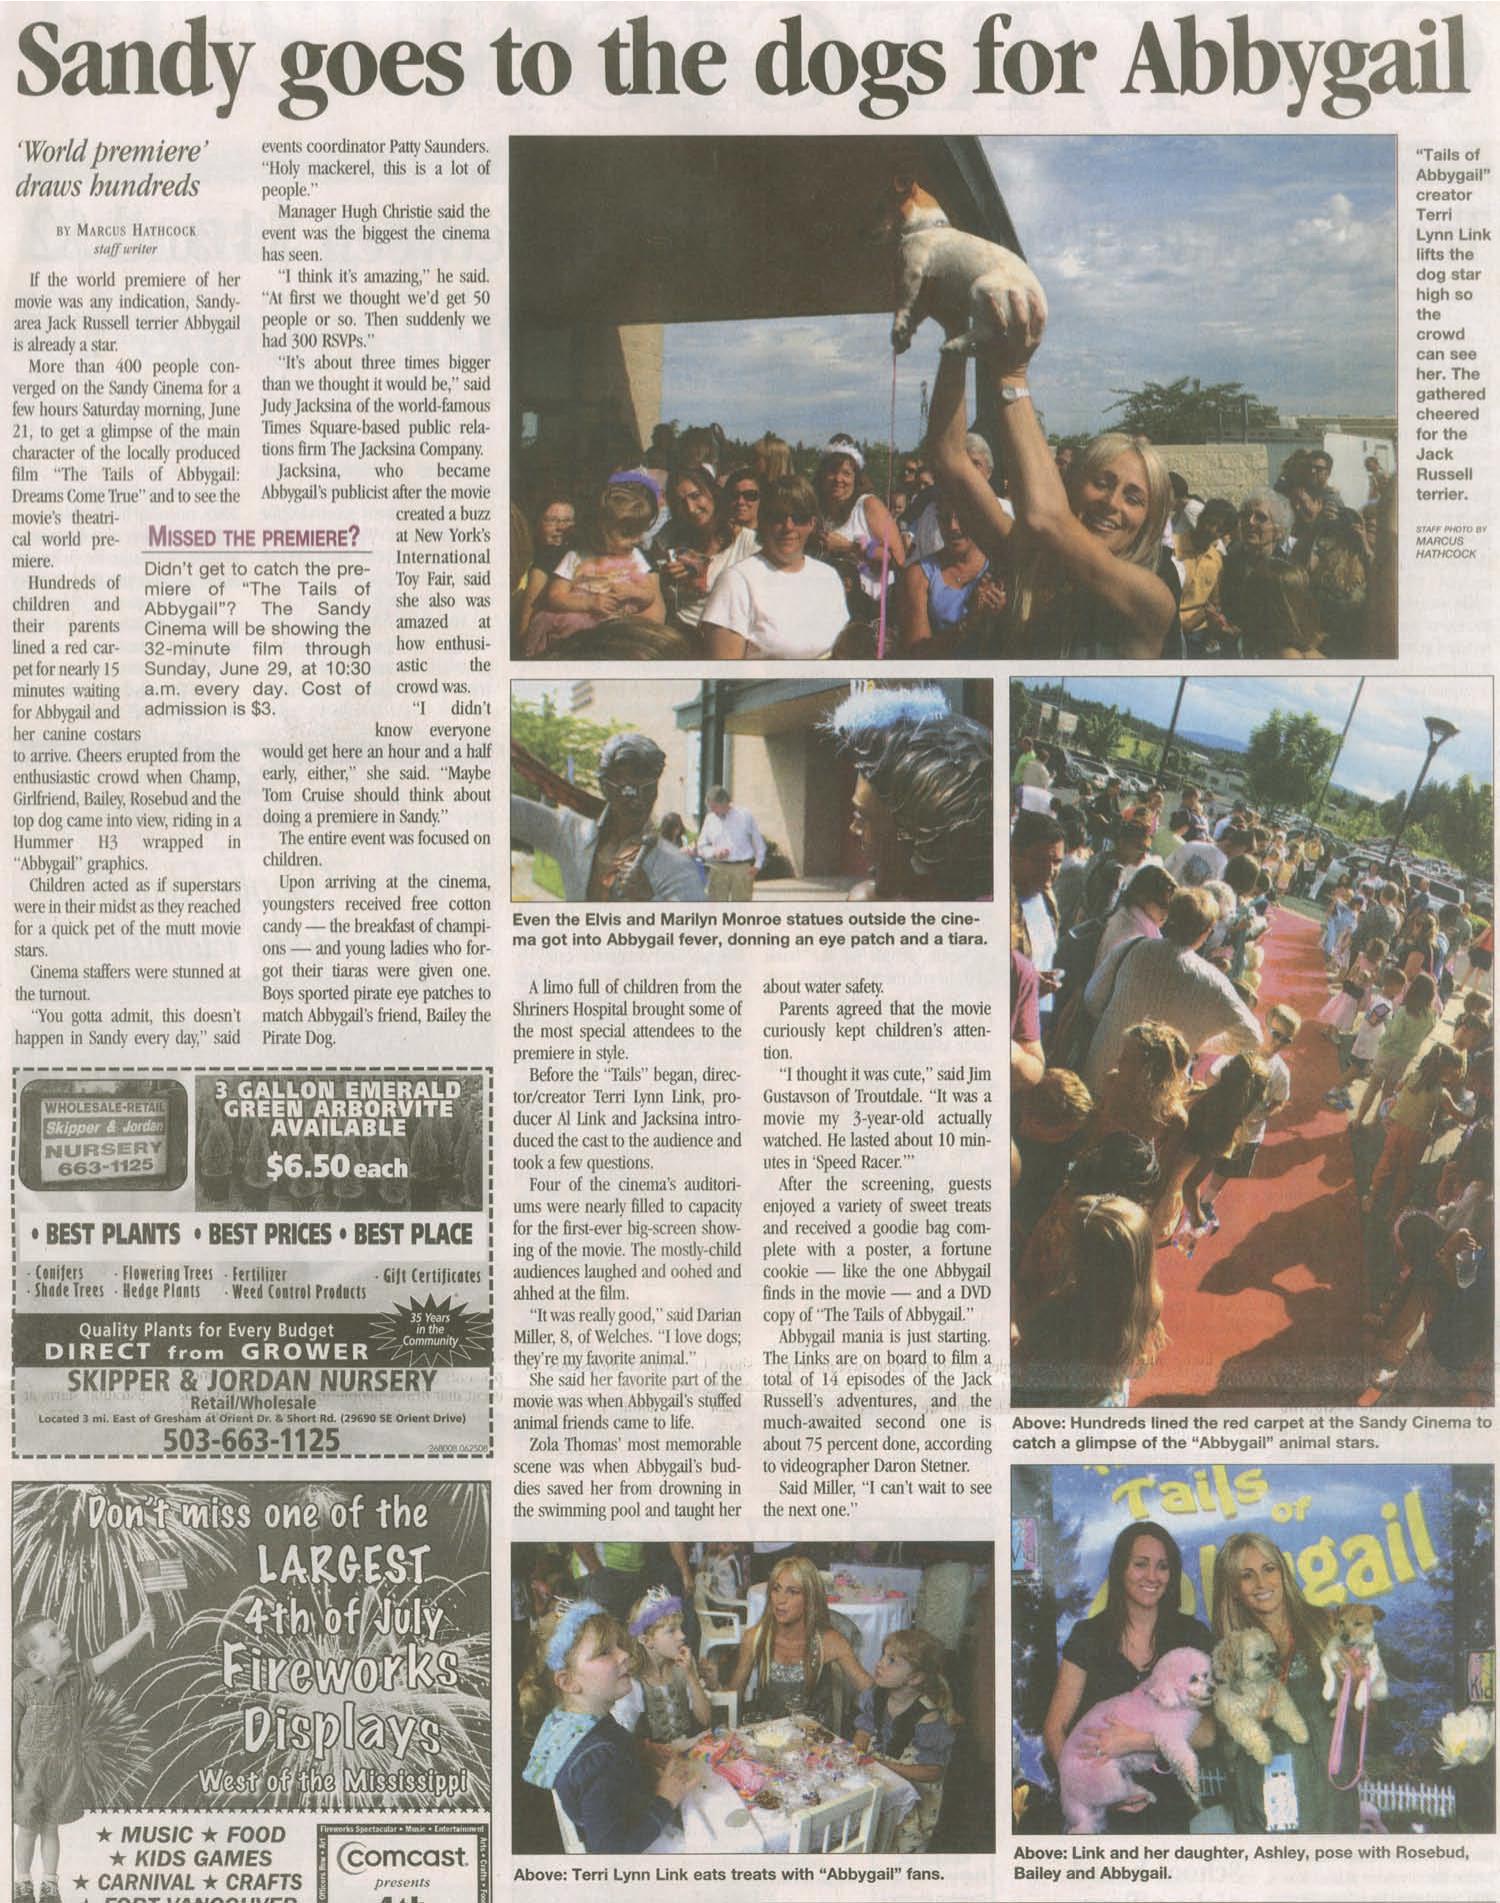 Abbygail Premier Article in Sandy Post